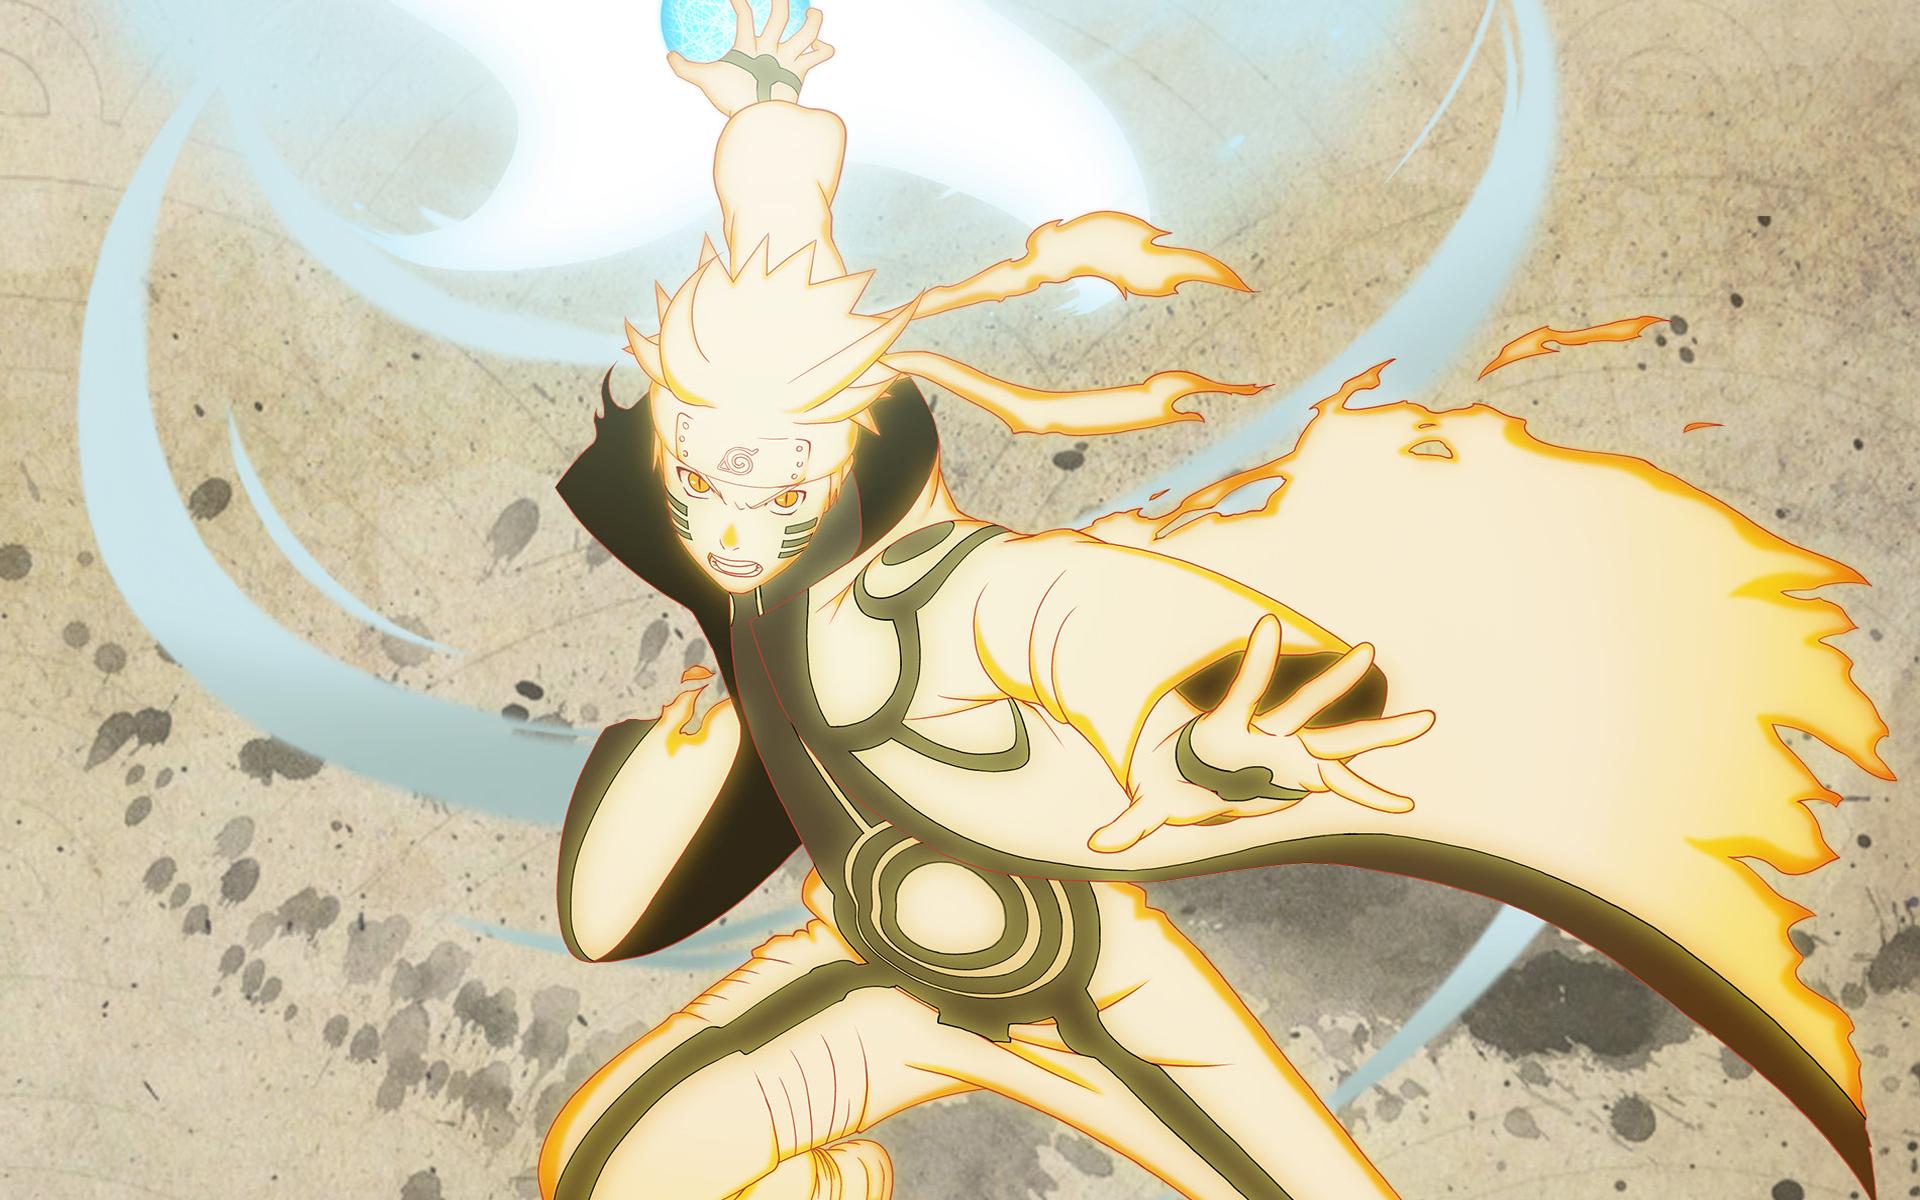 Cool Wallpaper Naruto Yellow - illustration-yellow-ART-naruto-shippuden-ultimate-ninja-storm-4-568210  Pictures.jpg